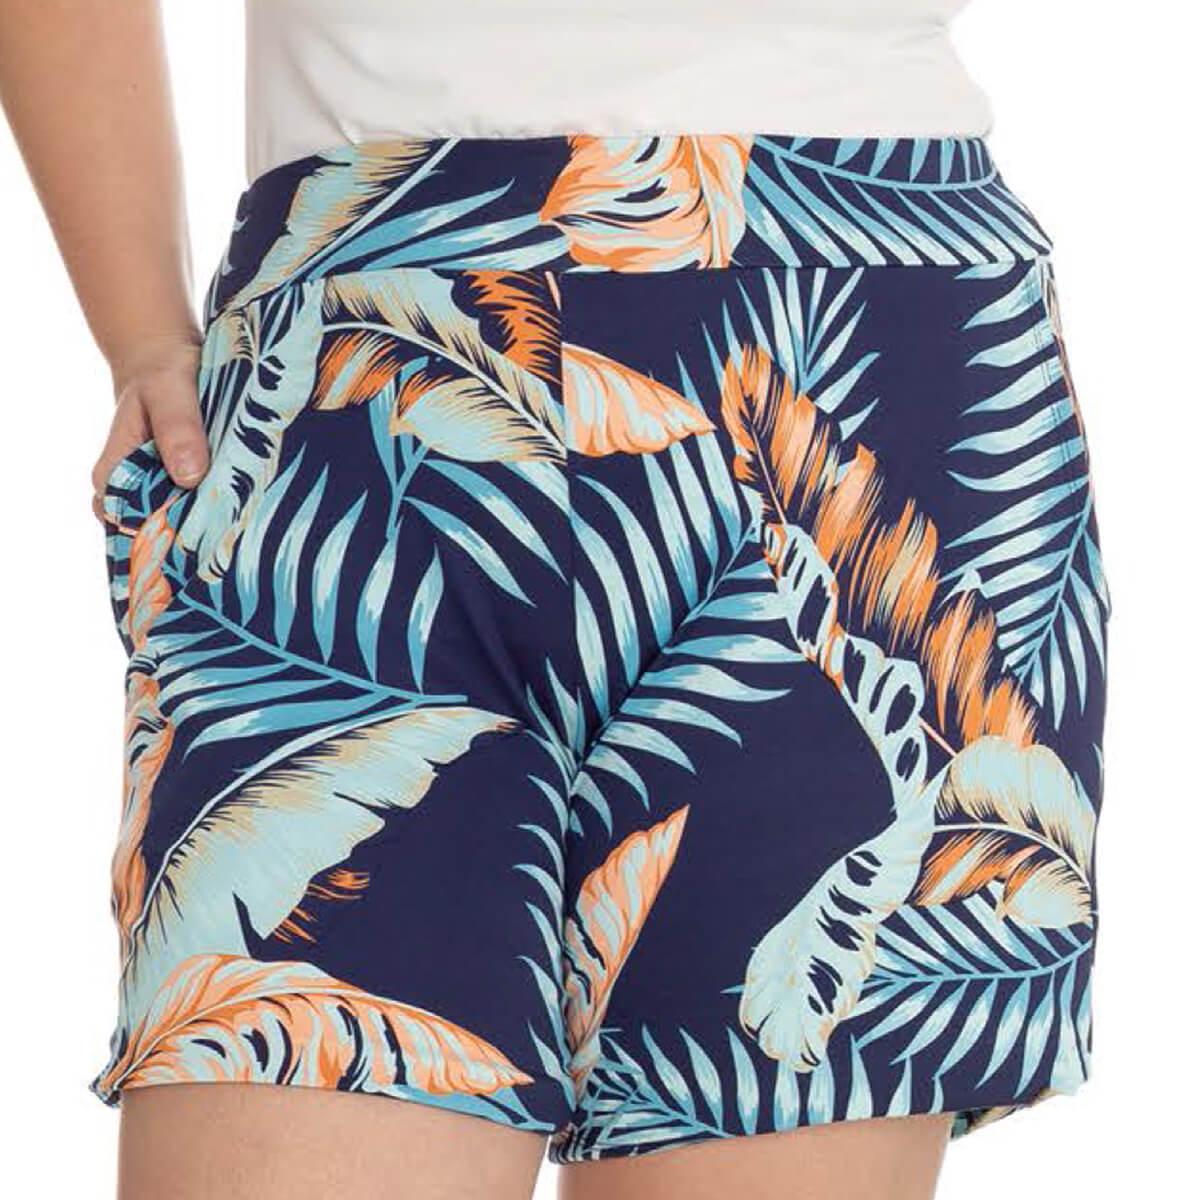 Shorts Feminino Plus Size Cetim Estampado Danny